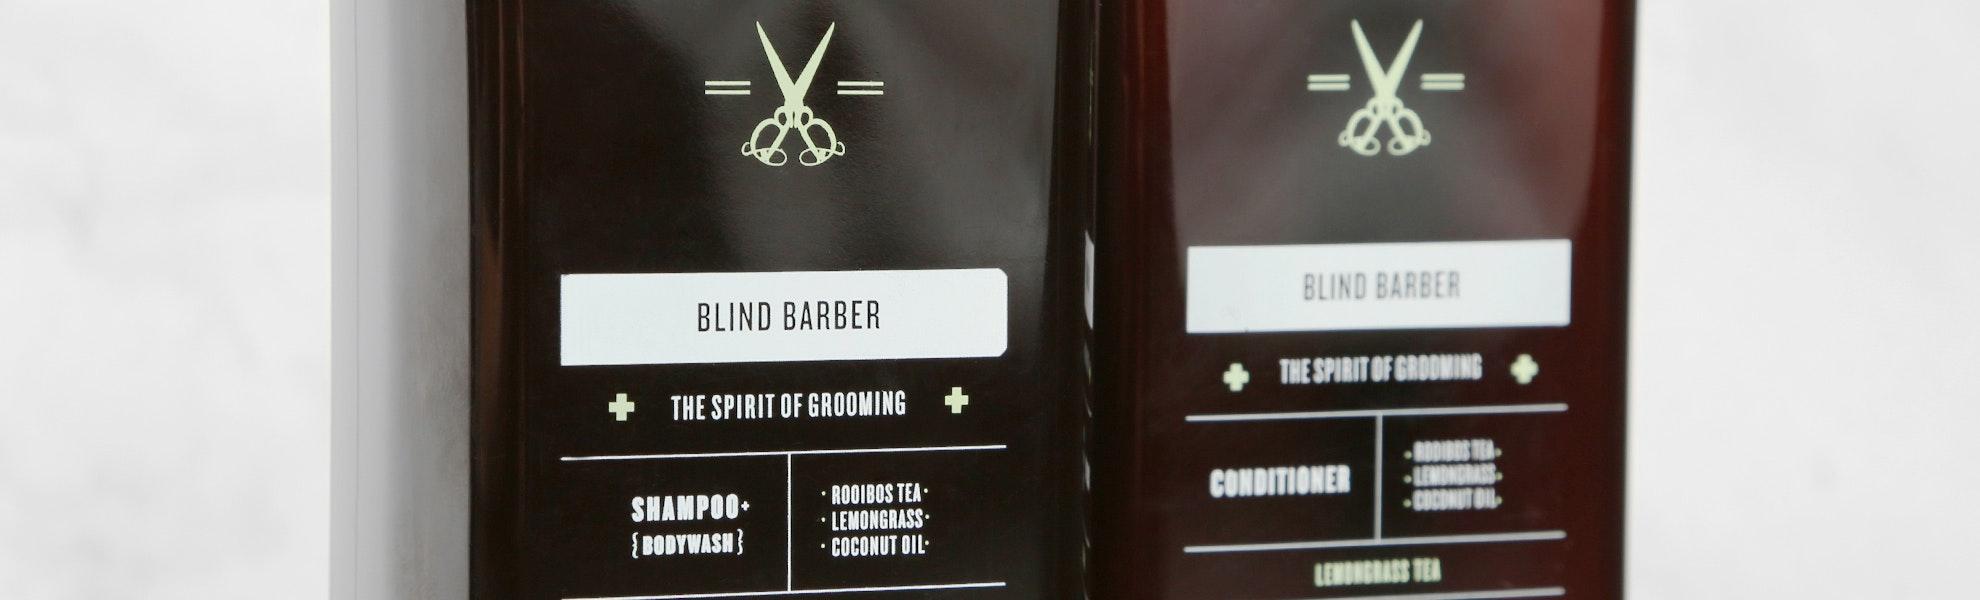 Blind Barber Hair & Body Bundle